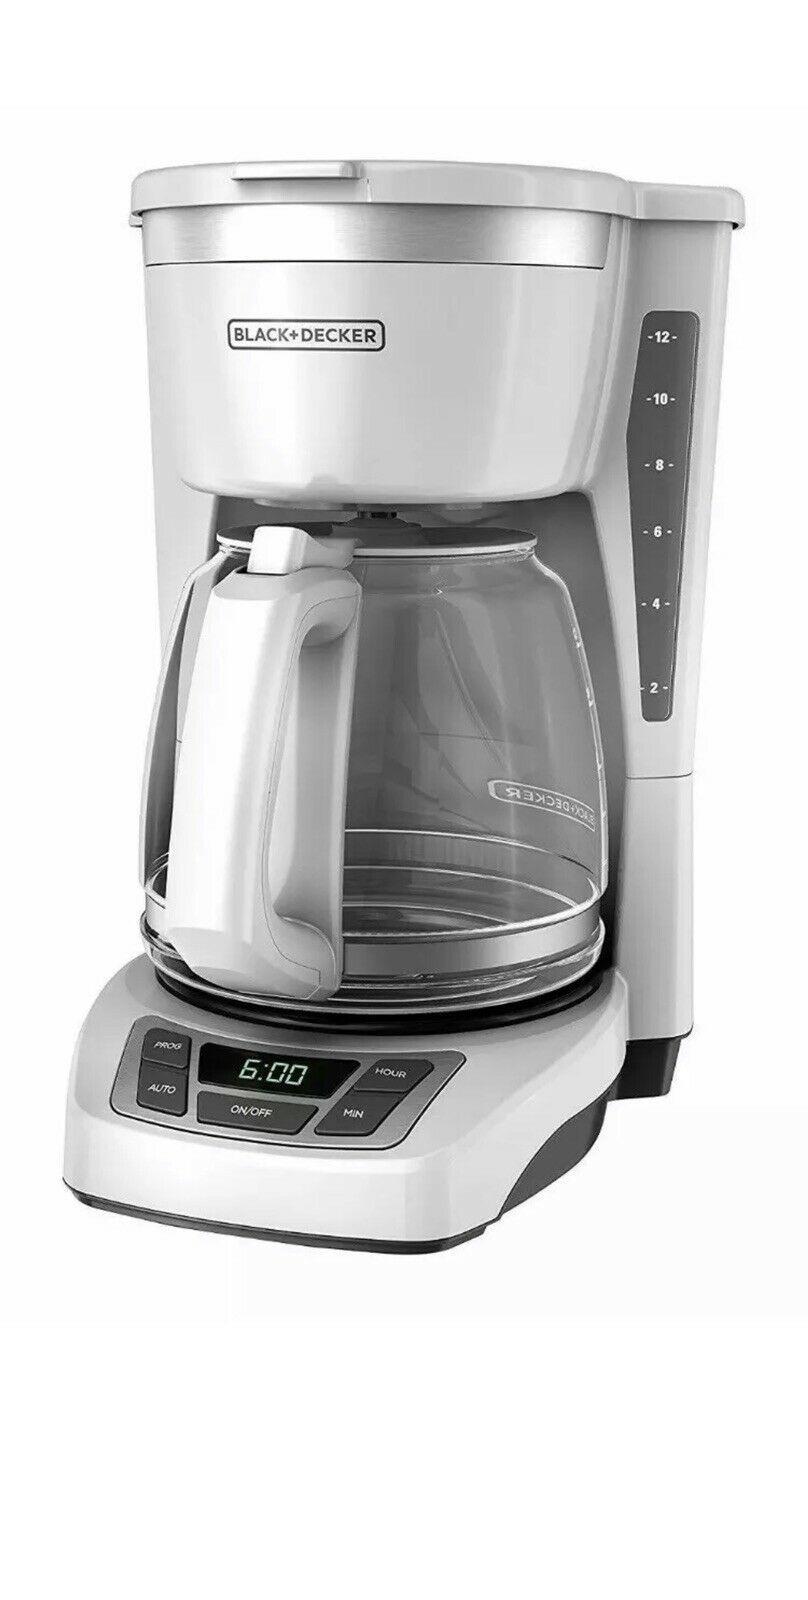 Blackdecker 12cup quicktouch programmable coffeemaker